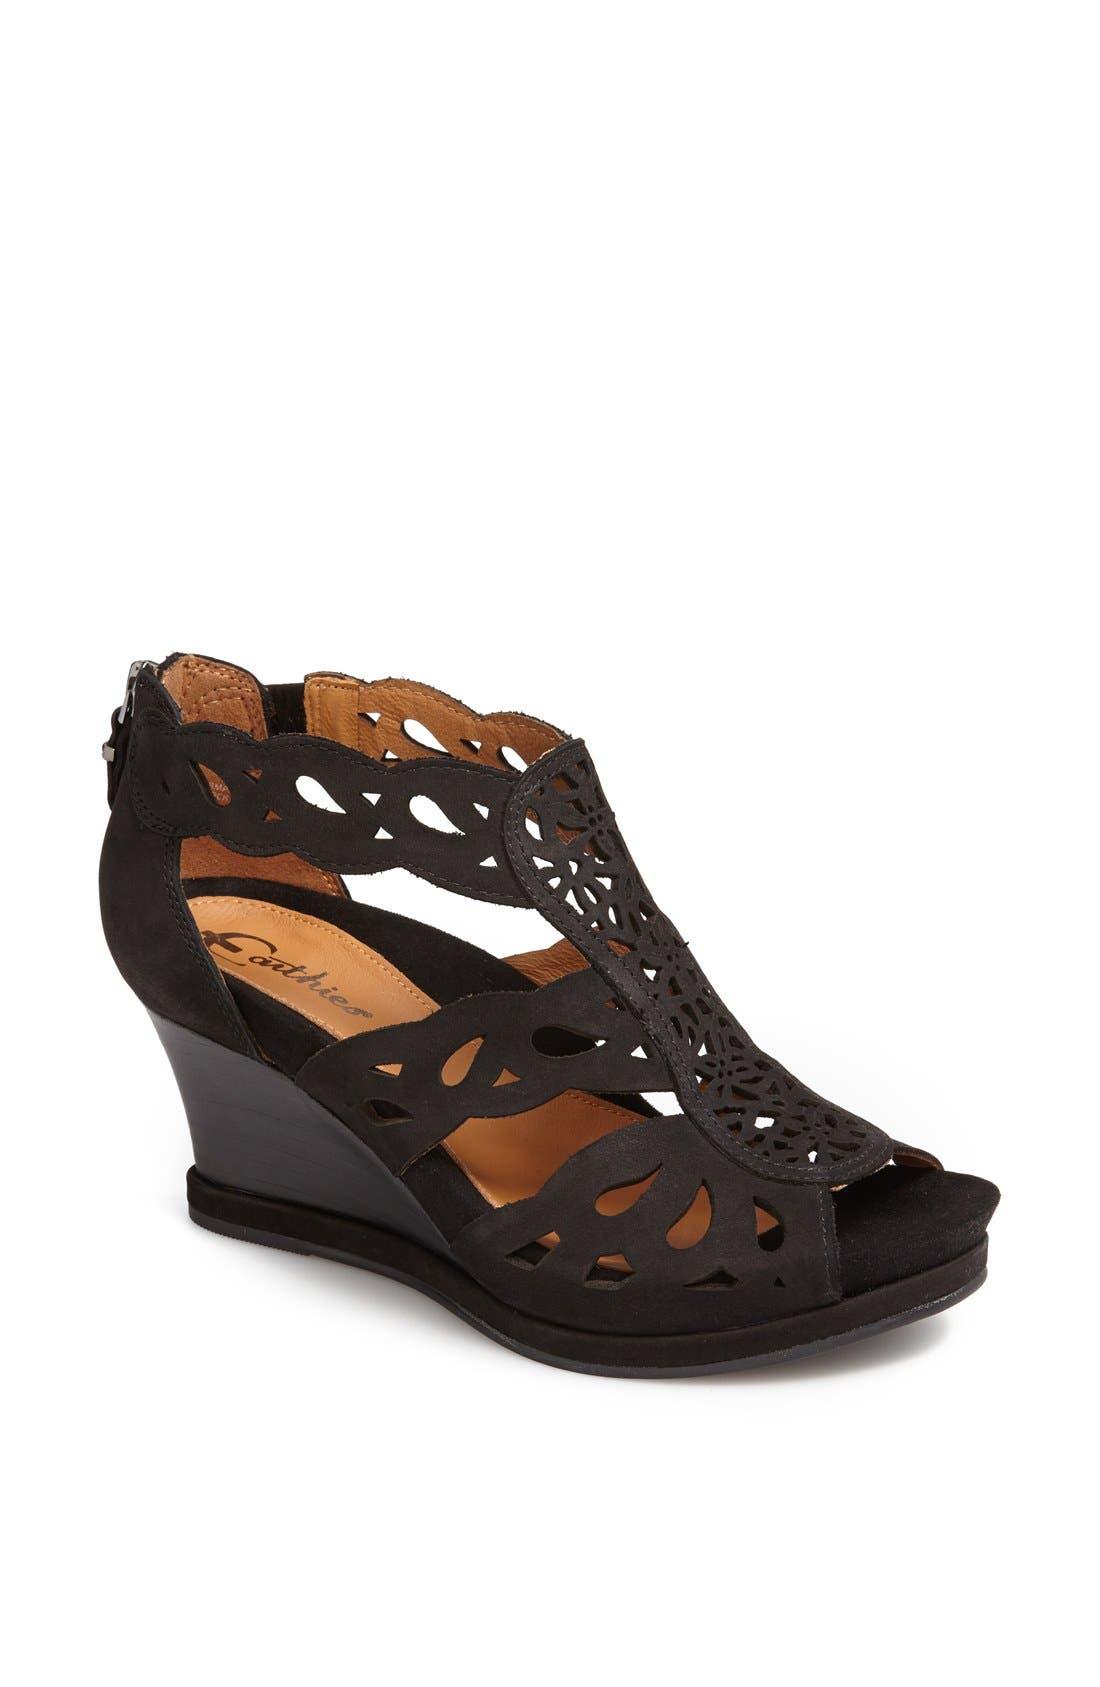 Main Image - Earthies® 'Campora' Wedge Sandal